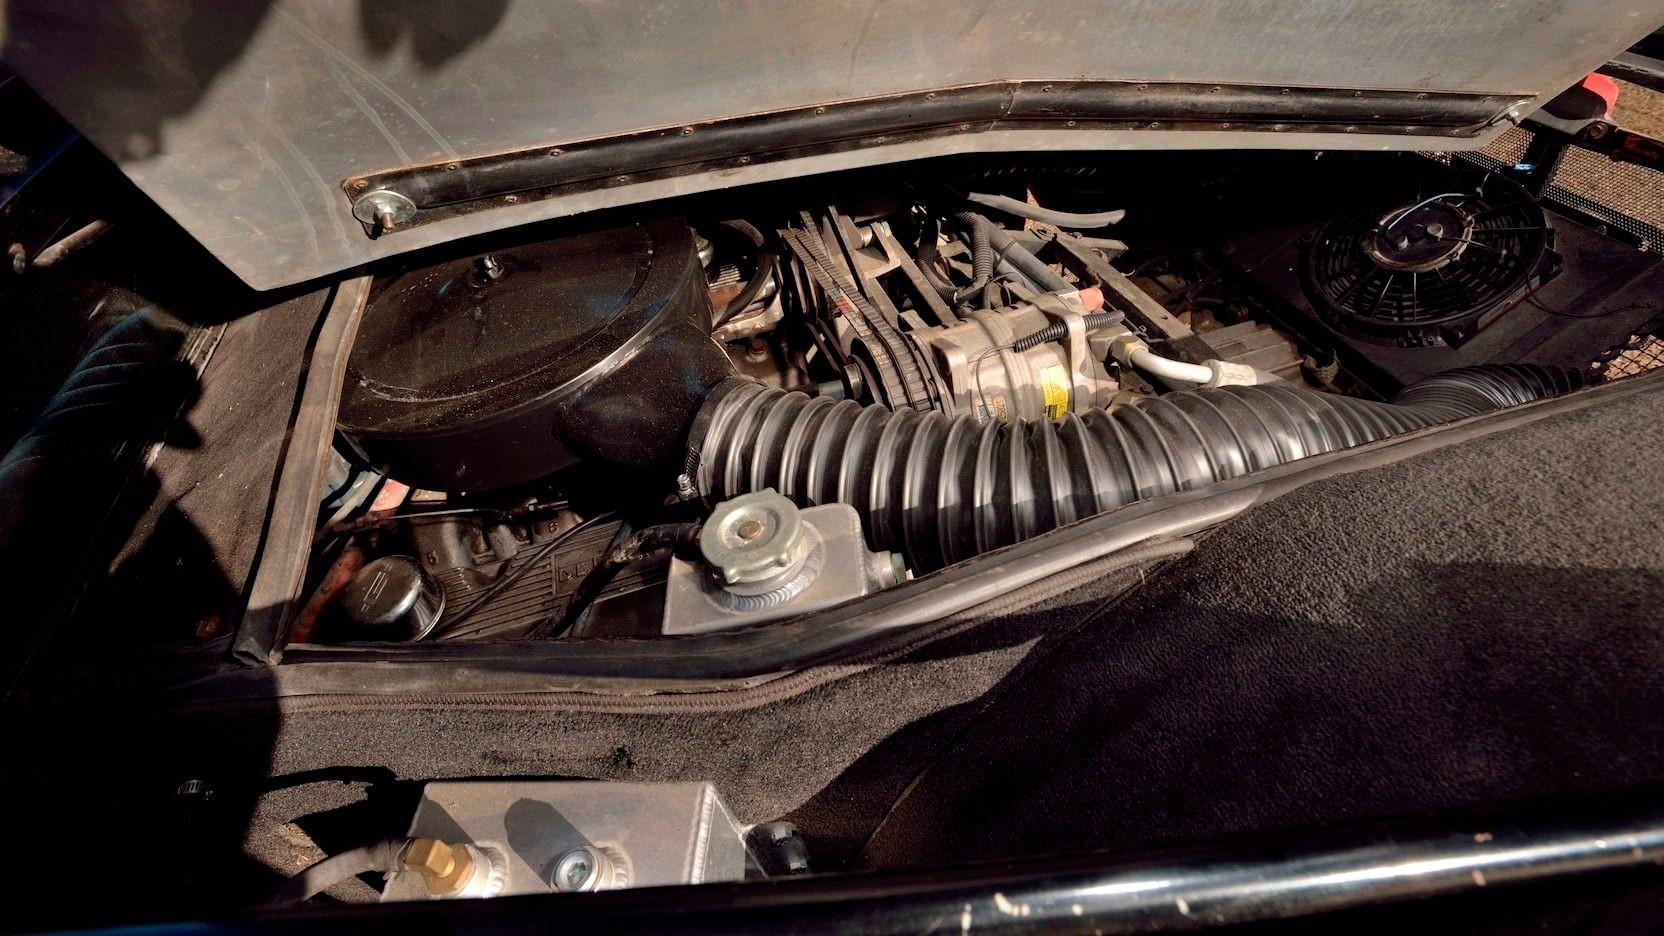 Спорткар De Tomaso Mangusta Shelby Mk V Prototype 1969 года